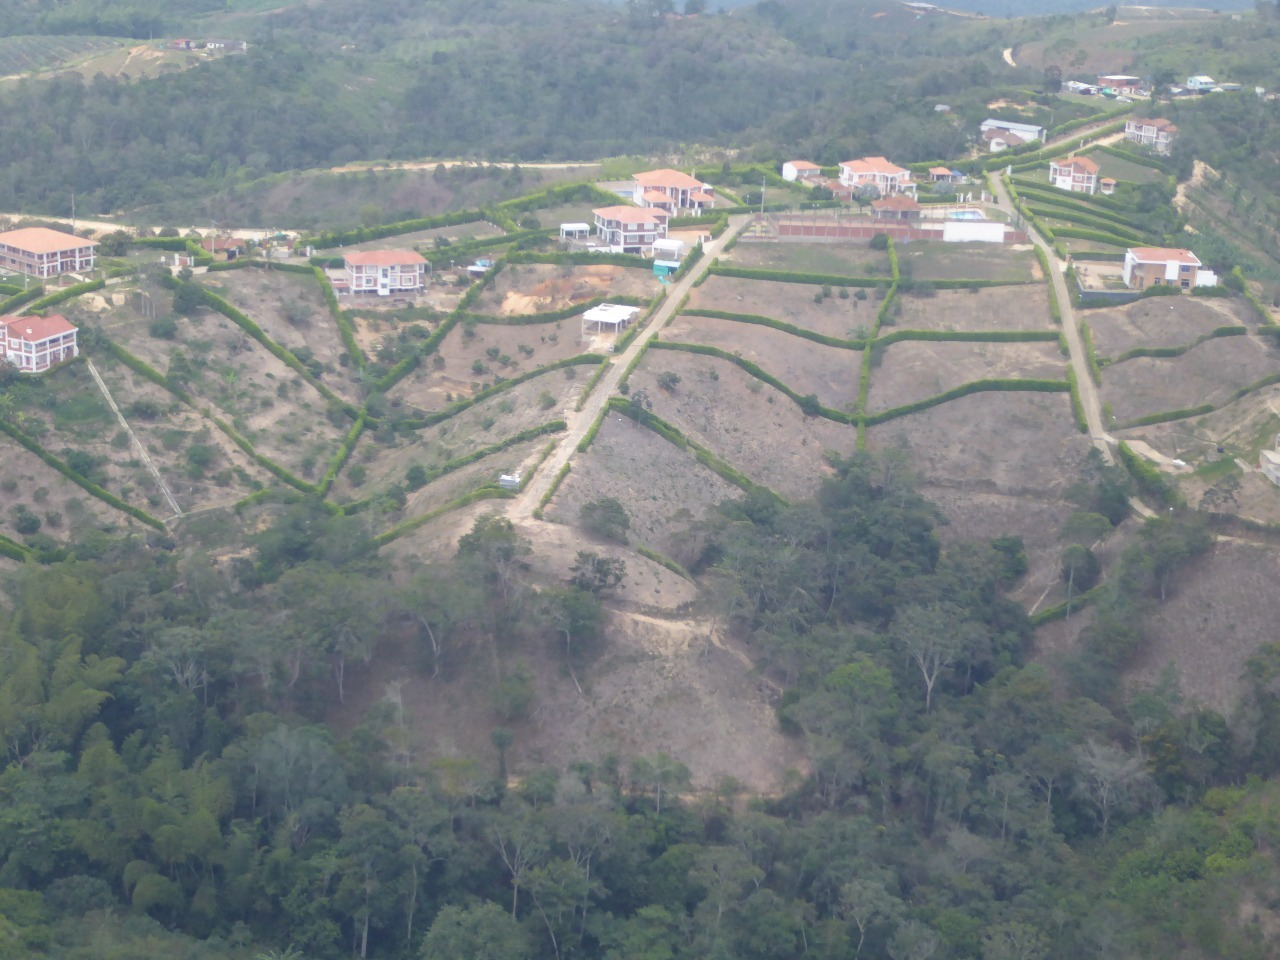 Leaving Bucaramanga